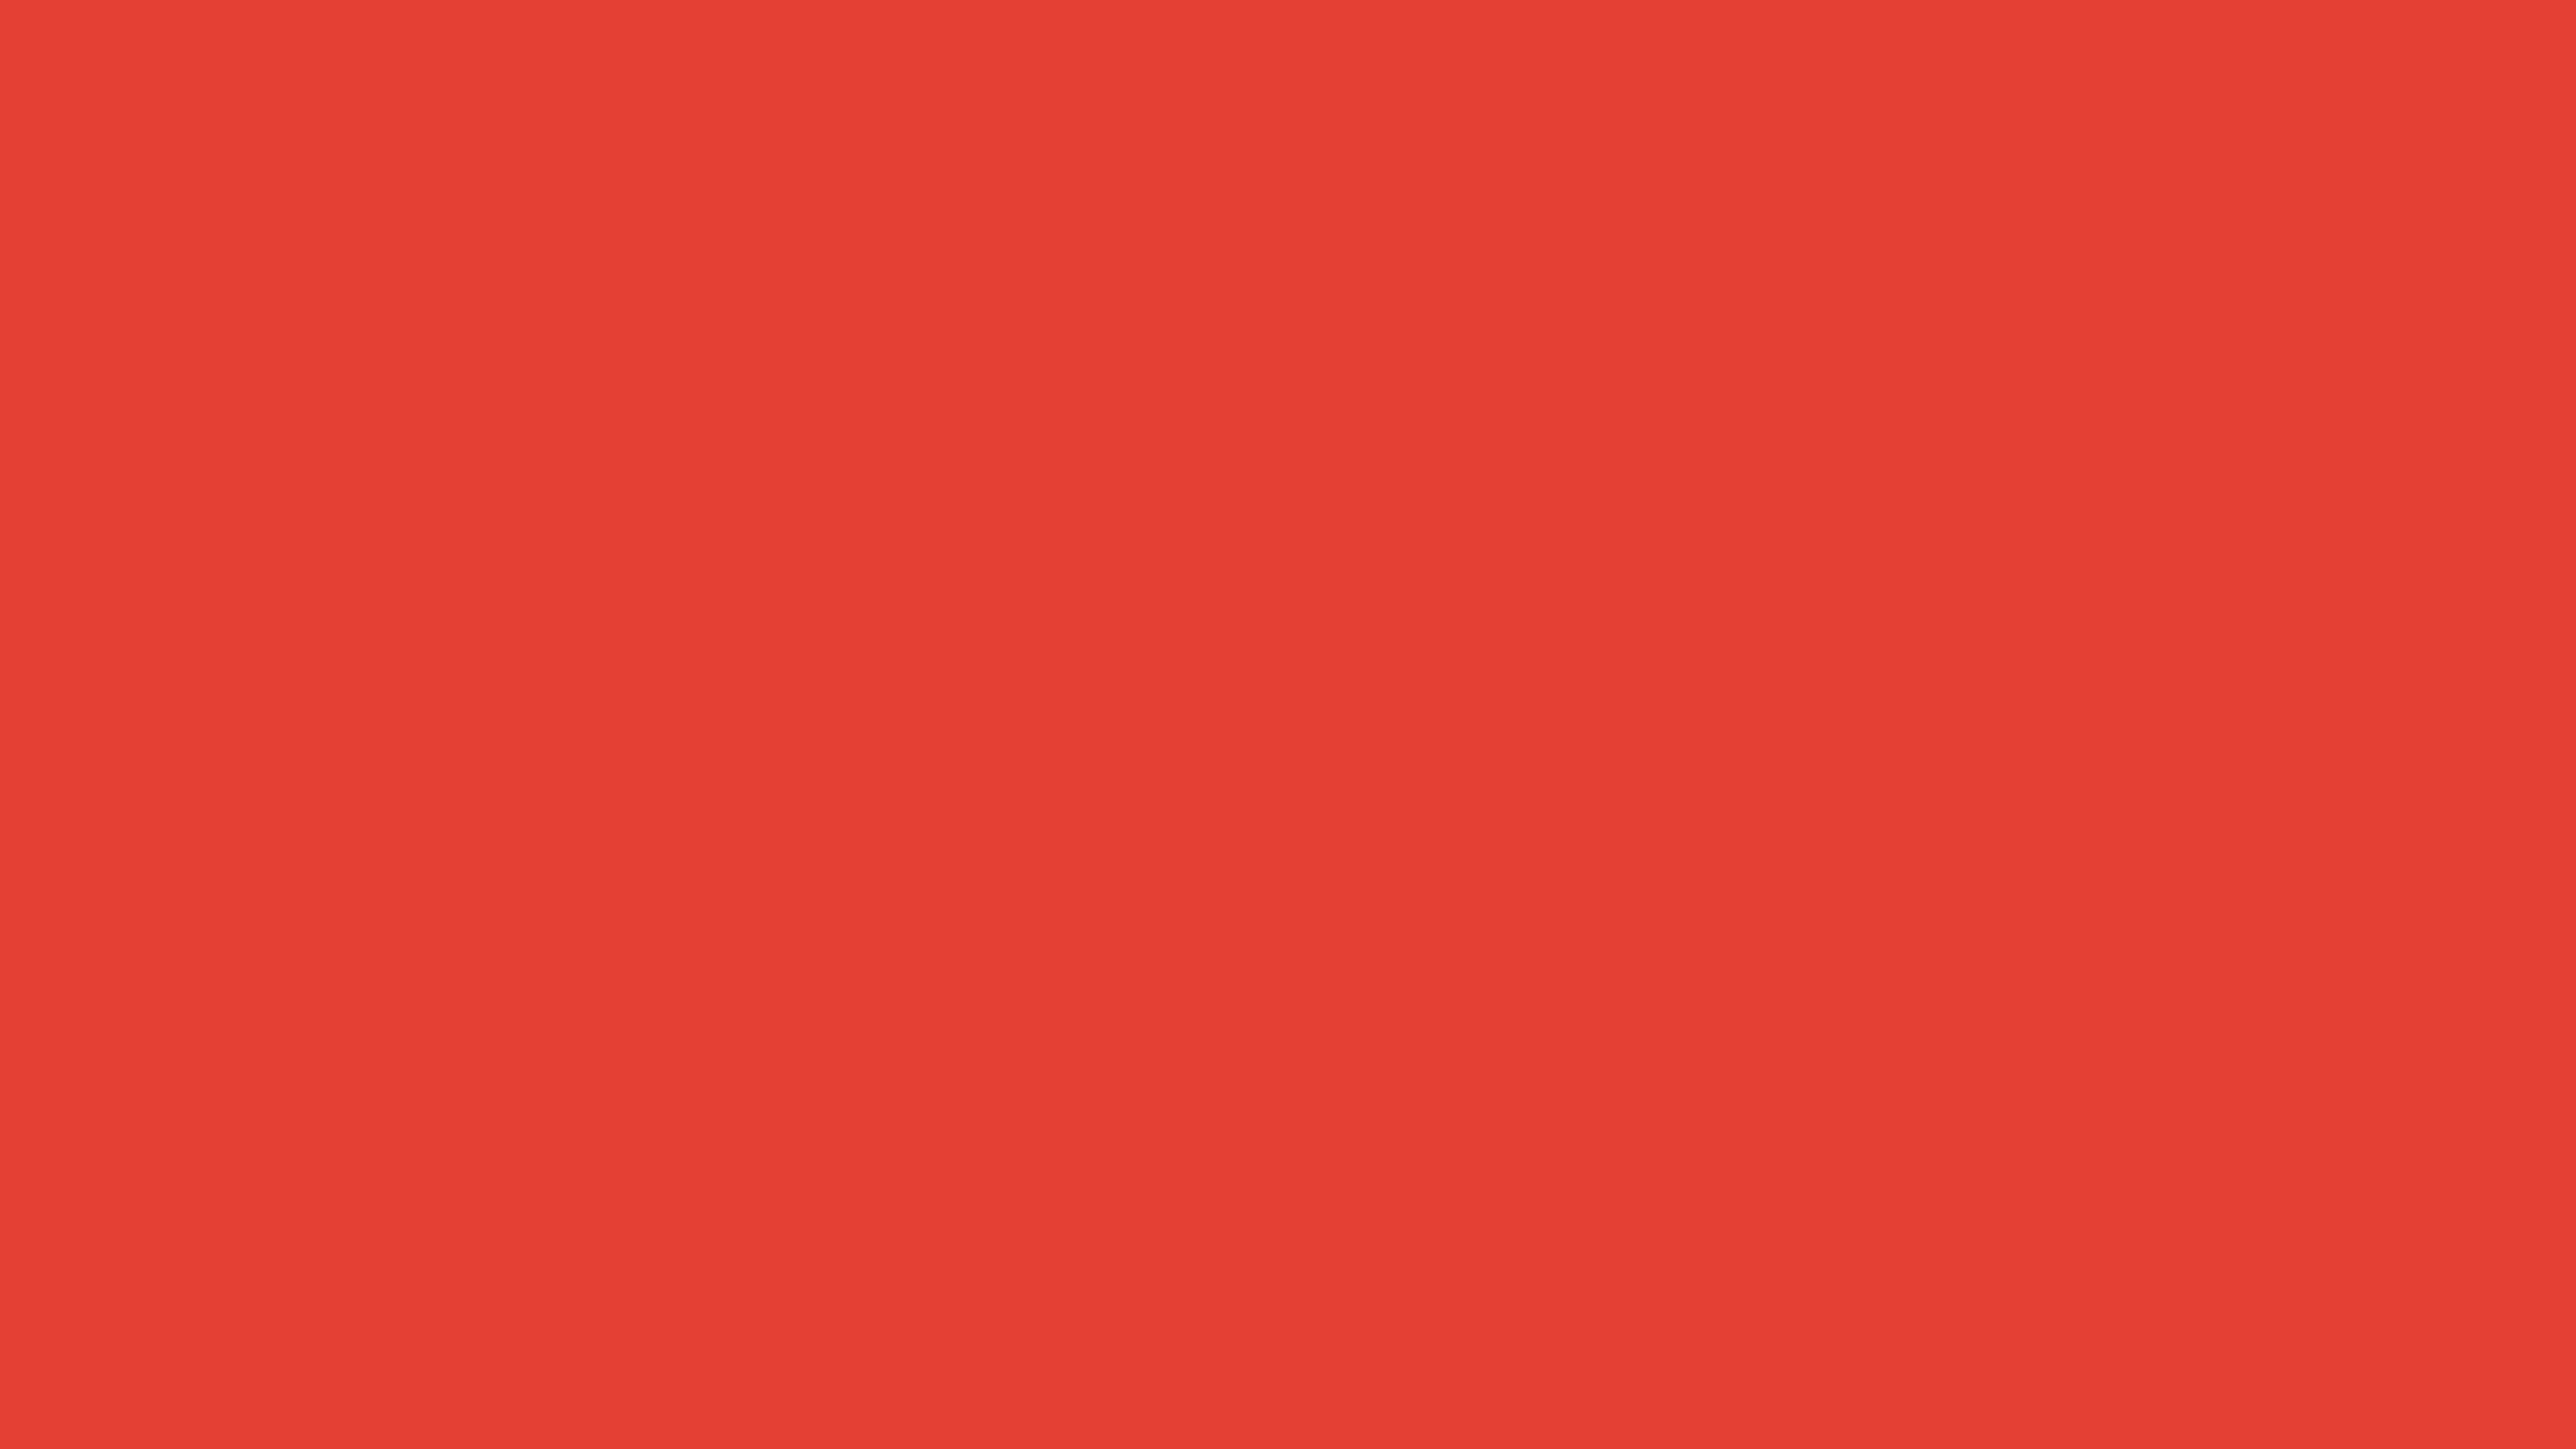 4096x2304 Vermilion Cinnabar Solid Color Background